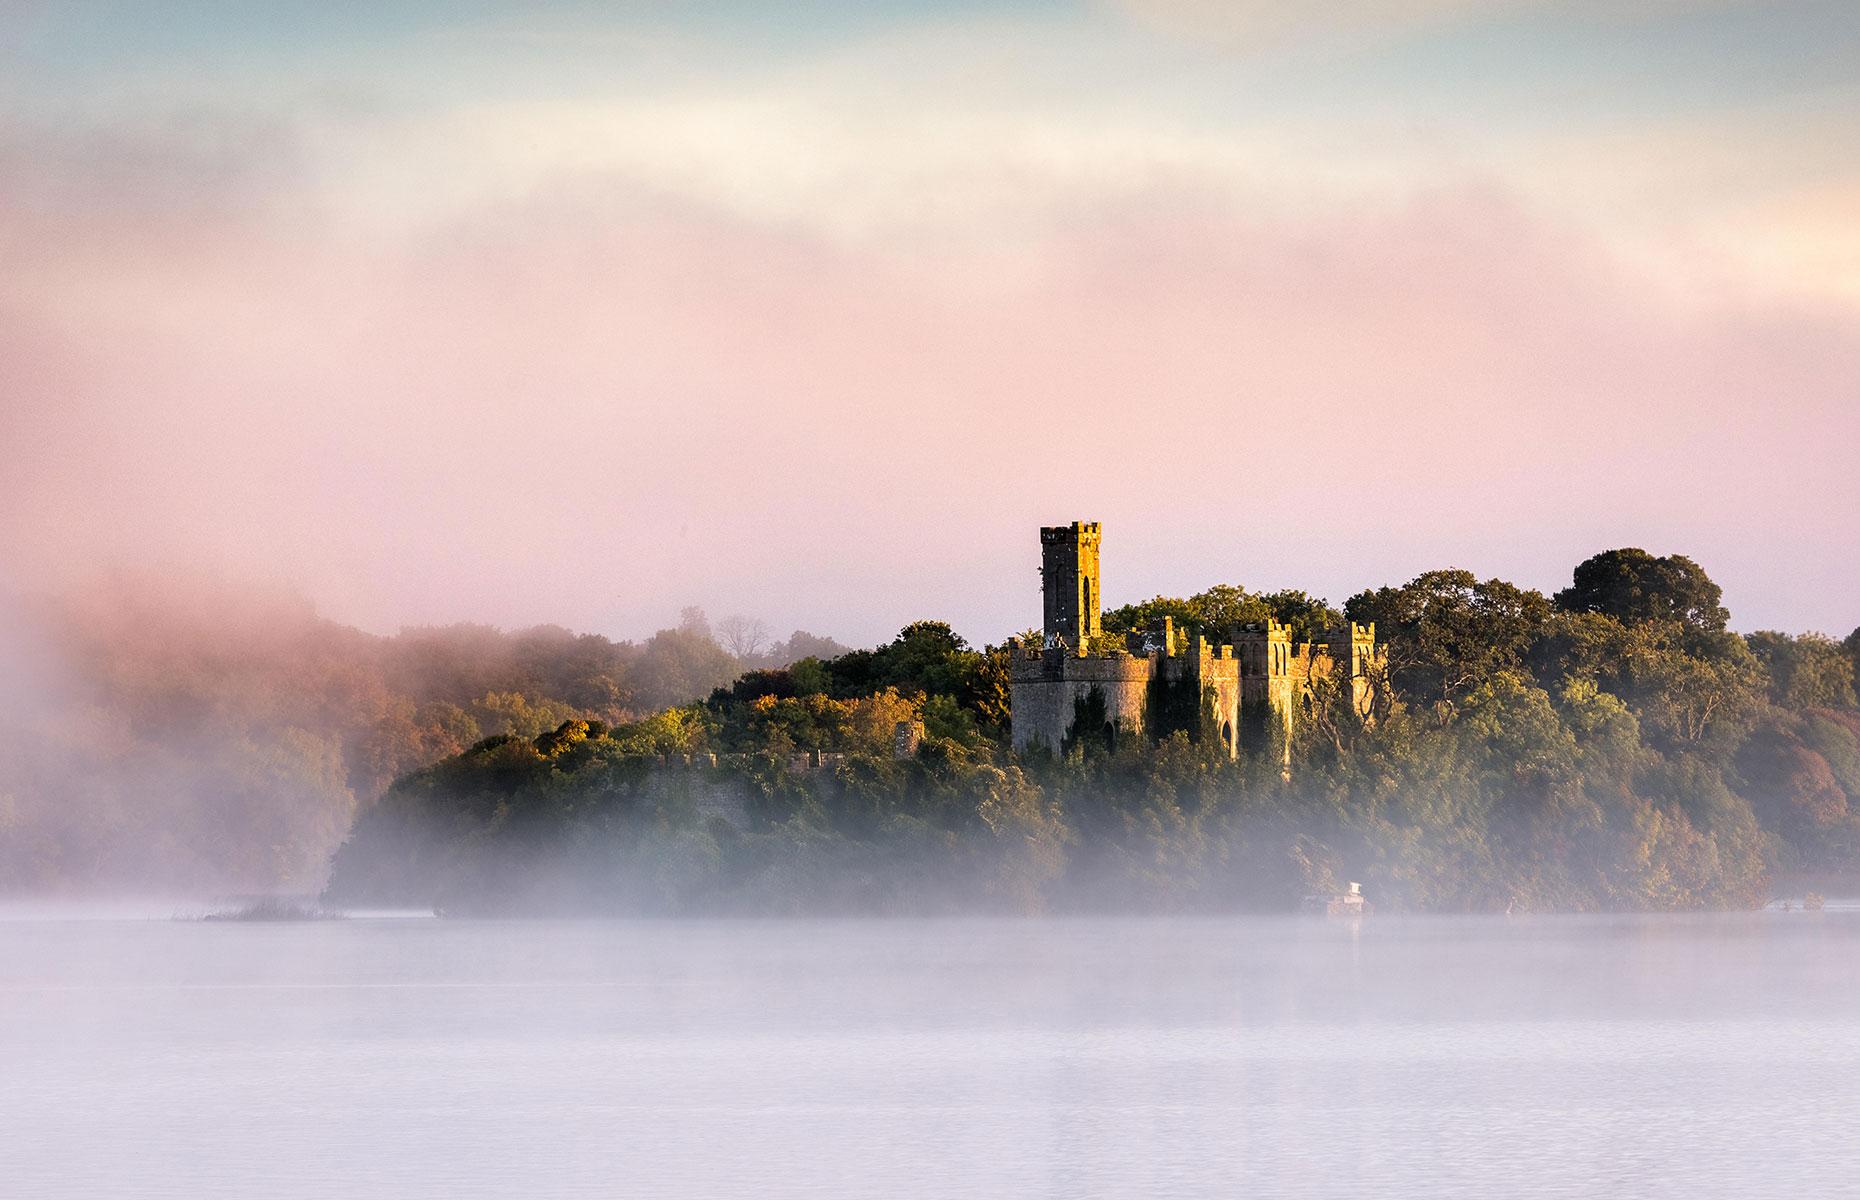 McDermott's Castle, Roscommon County photographed in the mist (robertharding/AlamyStock Photo)